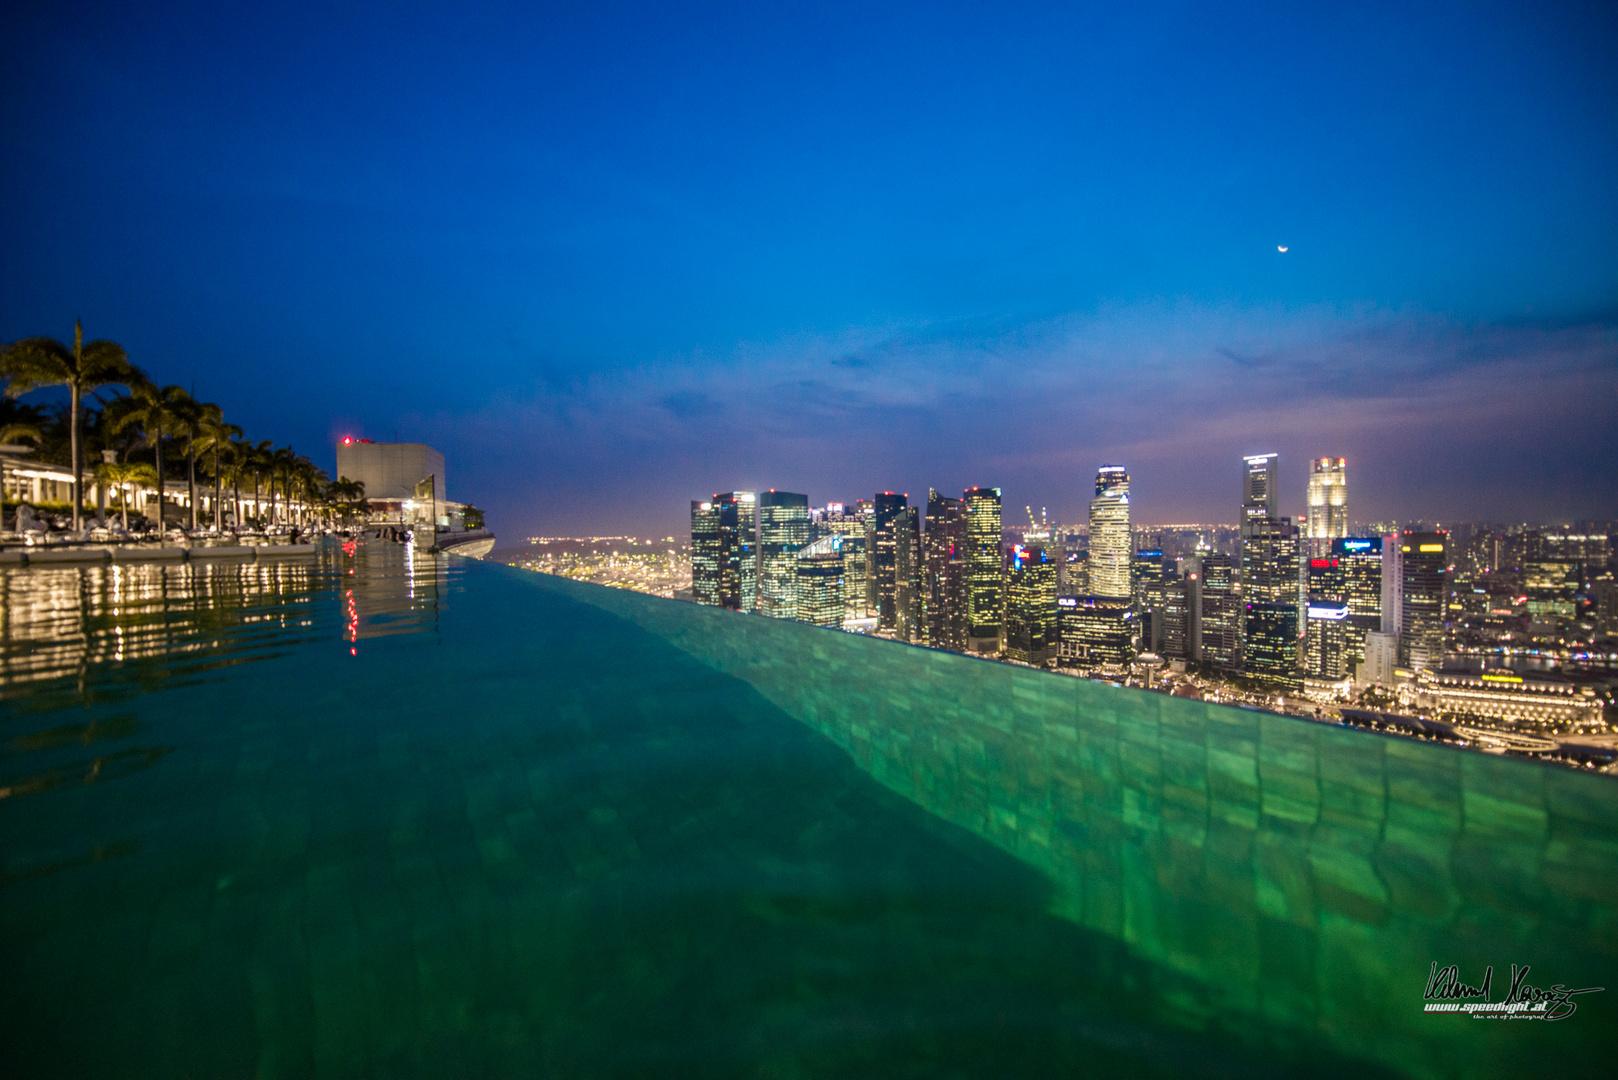 Infinity Pool, Marina Bay Sands, Singapur